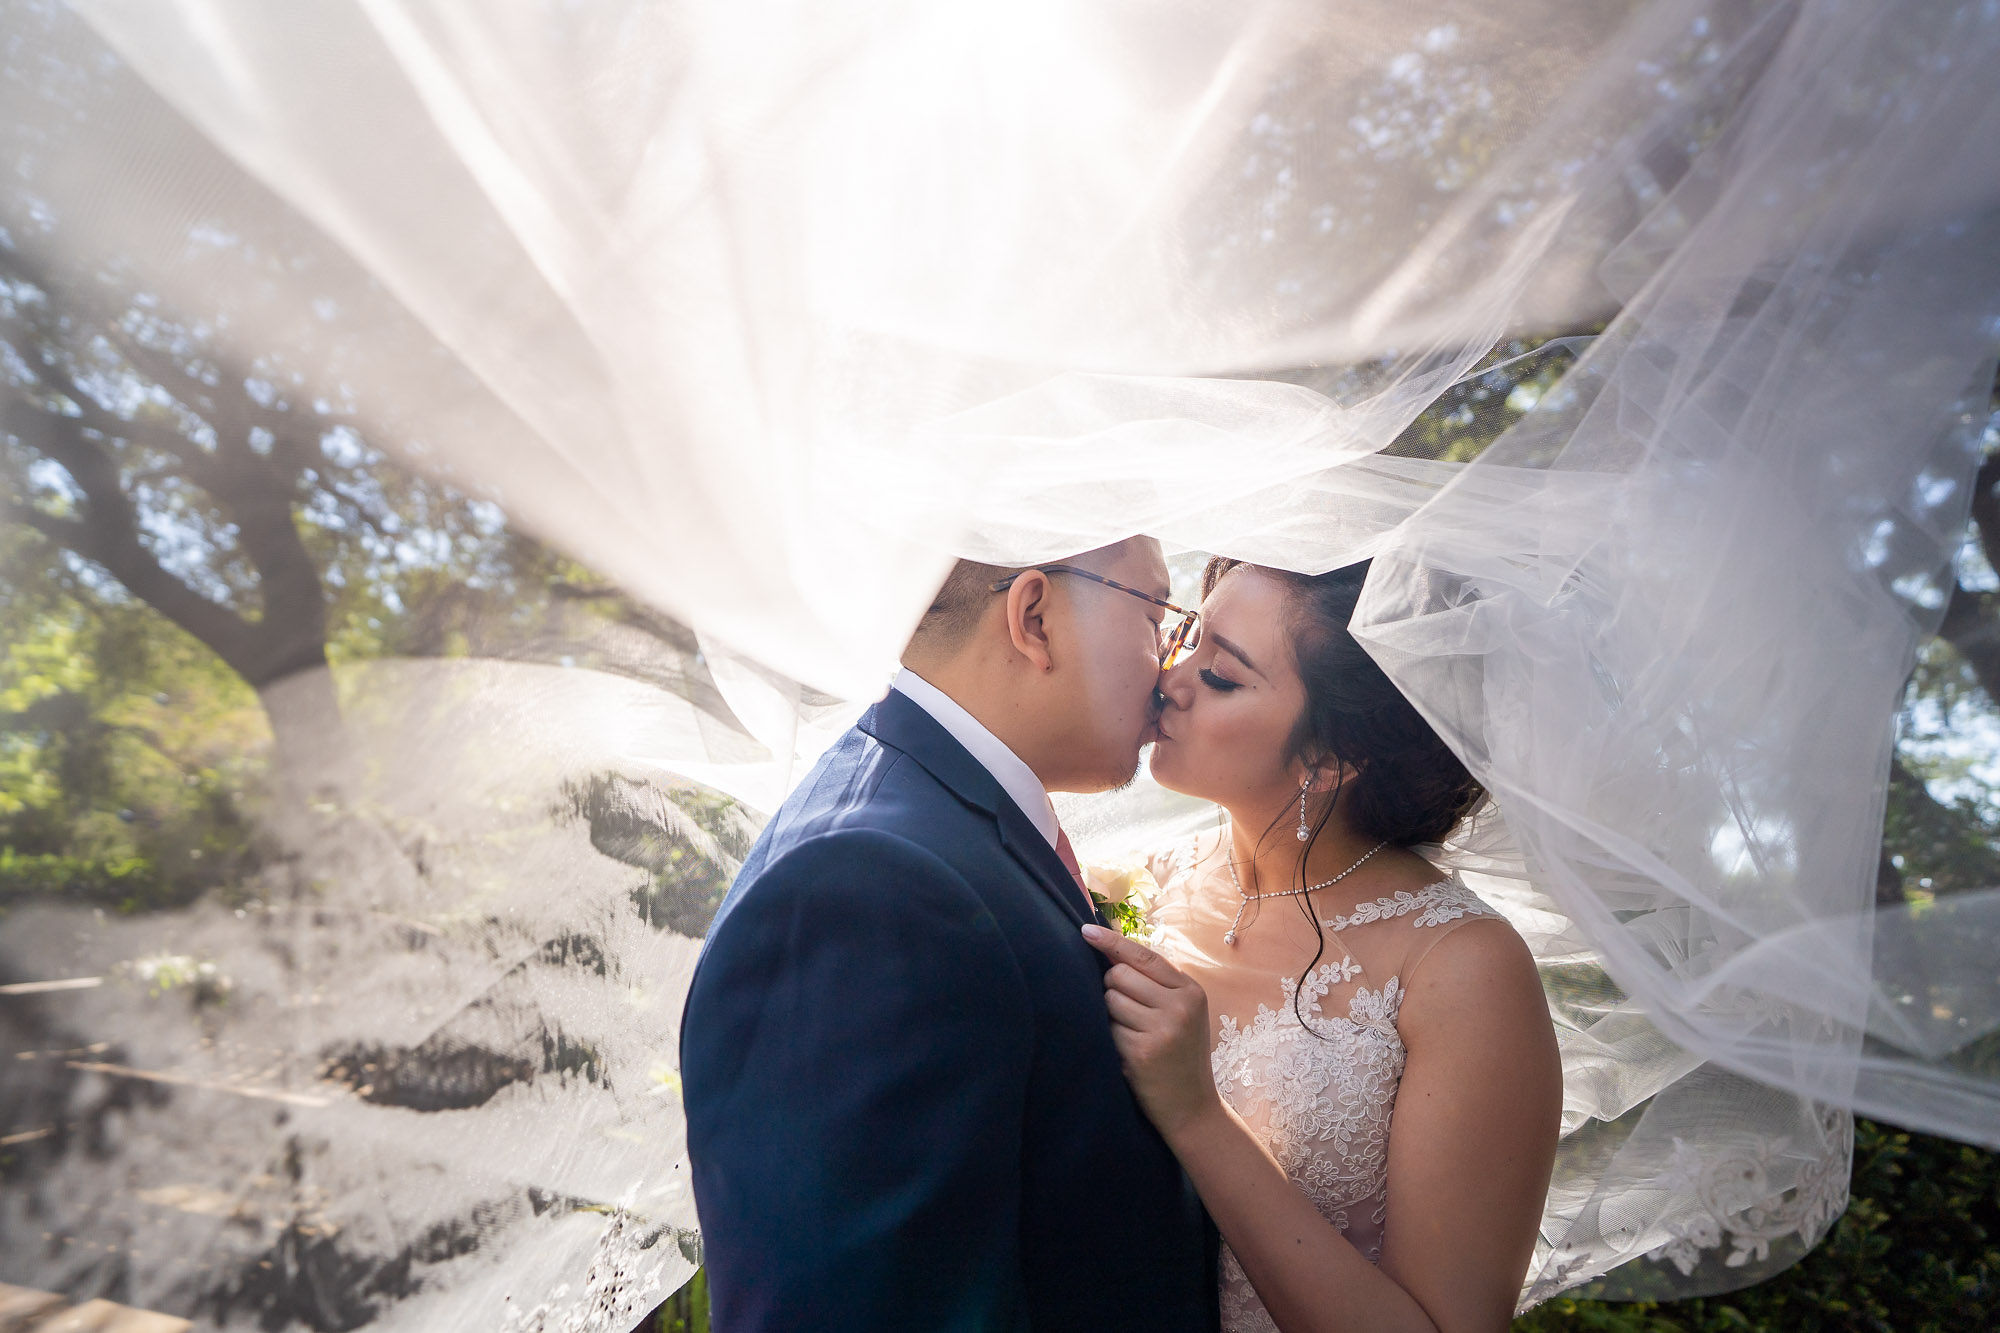 Resized-S&S-WeddingHighlights-21.jpg